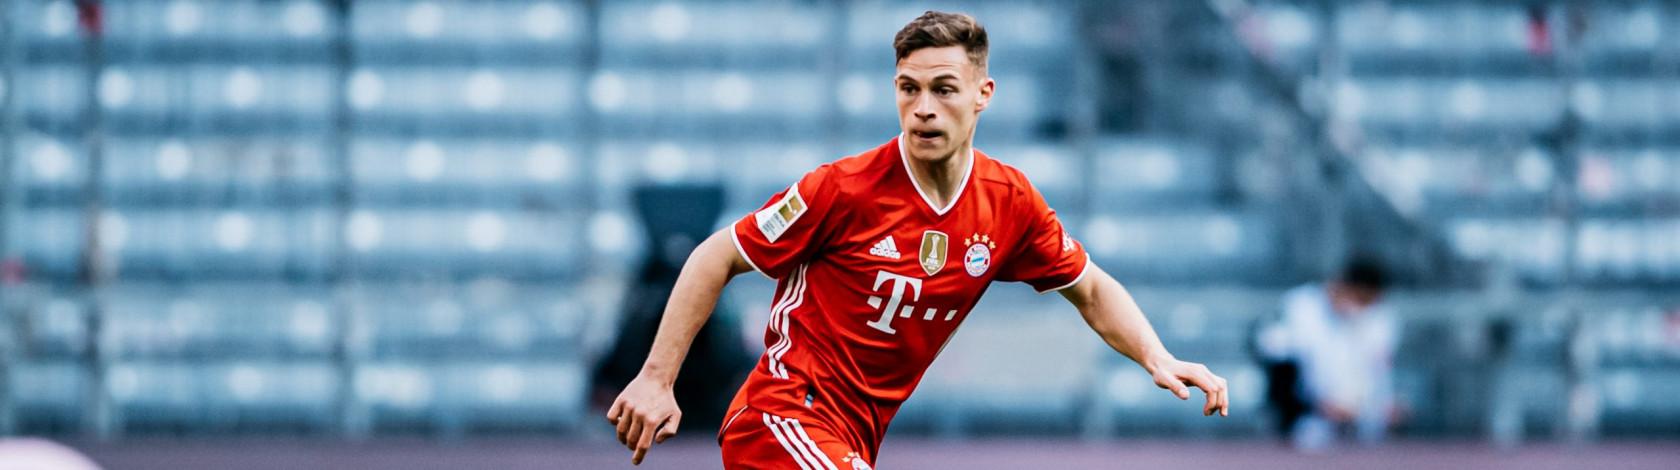 FC Bayern München v Borussia Mönchengladbach – Bundesliga for DFL